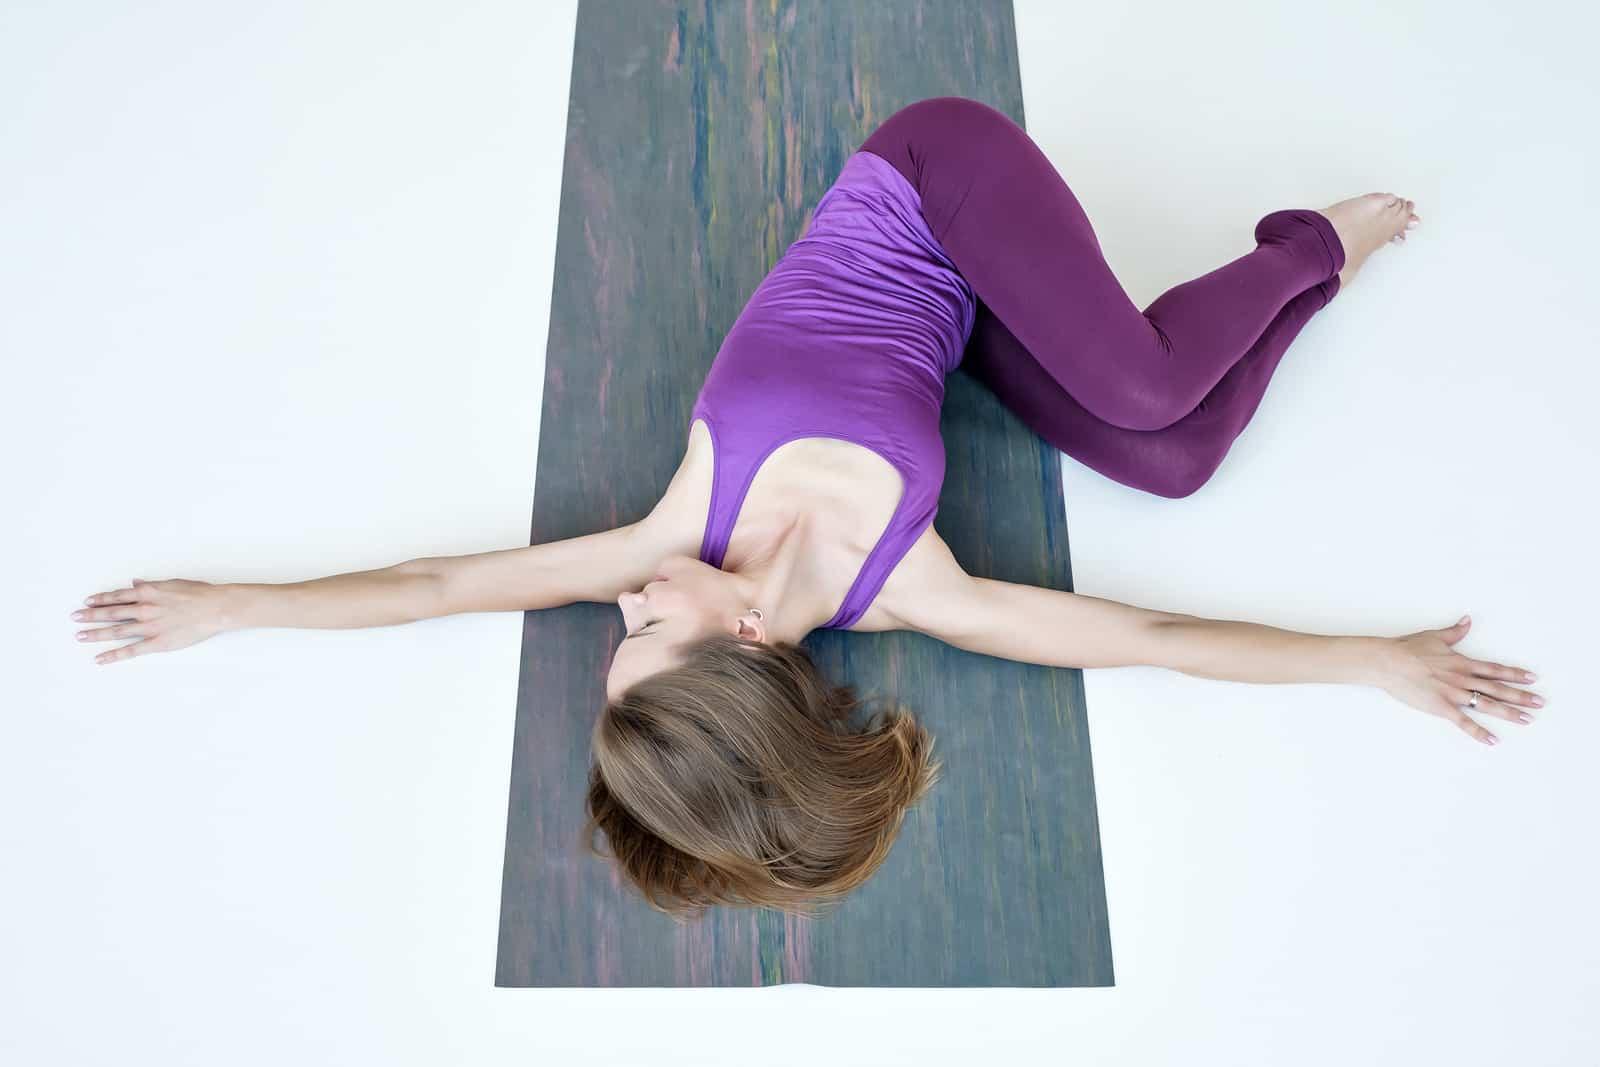 yoga for endometriosis pain: woman doing knee-down twist